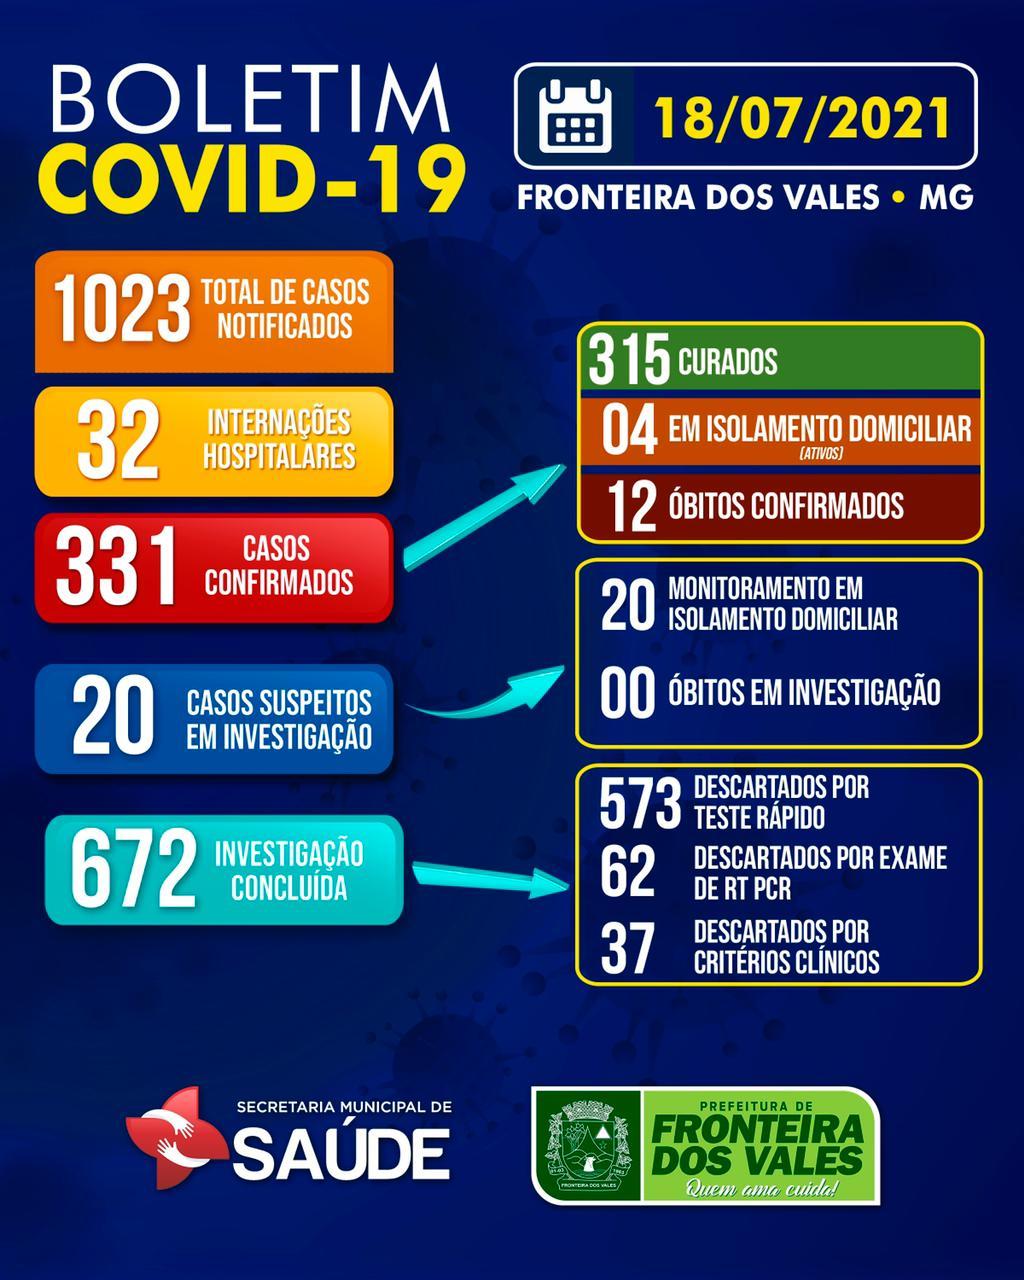 BOLETIM COVID-19 - 18/07/2021